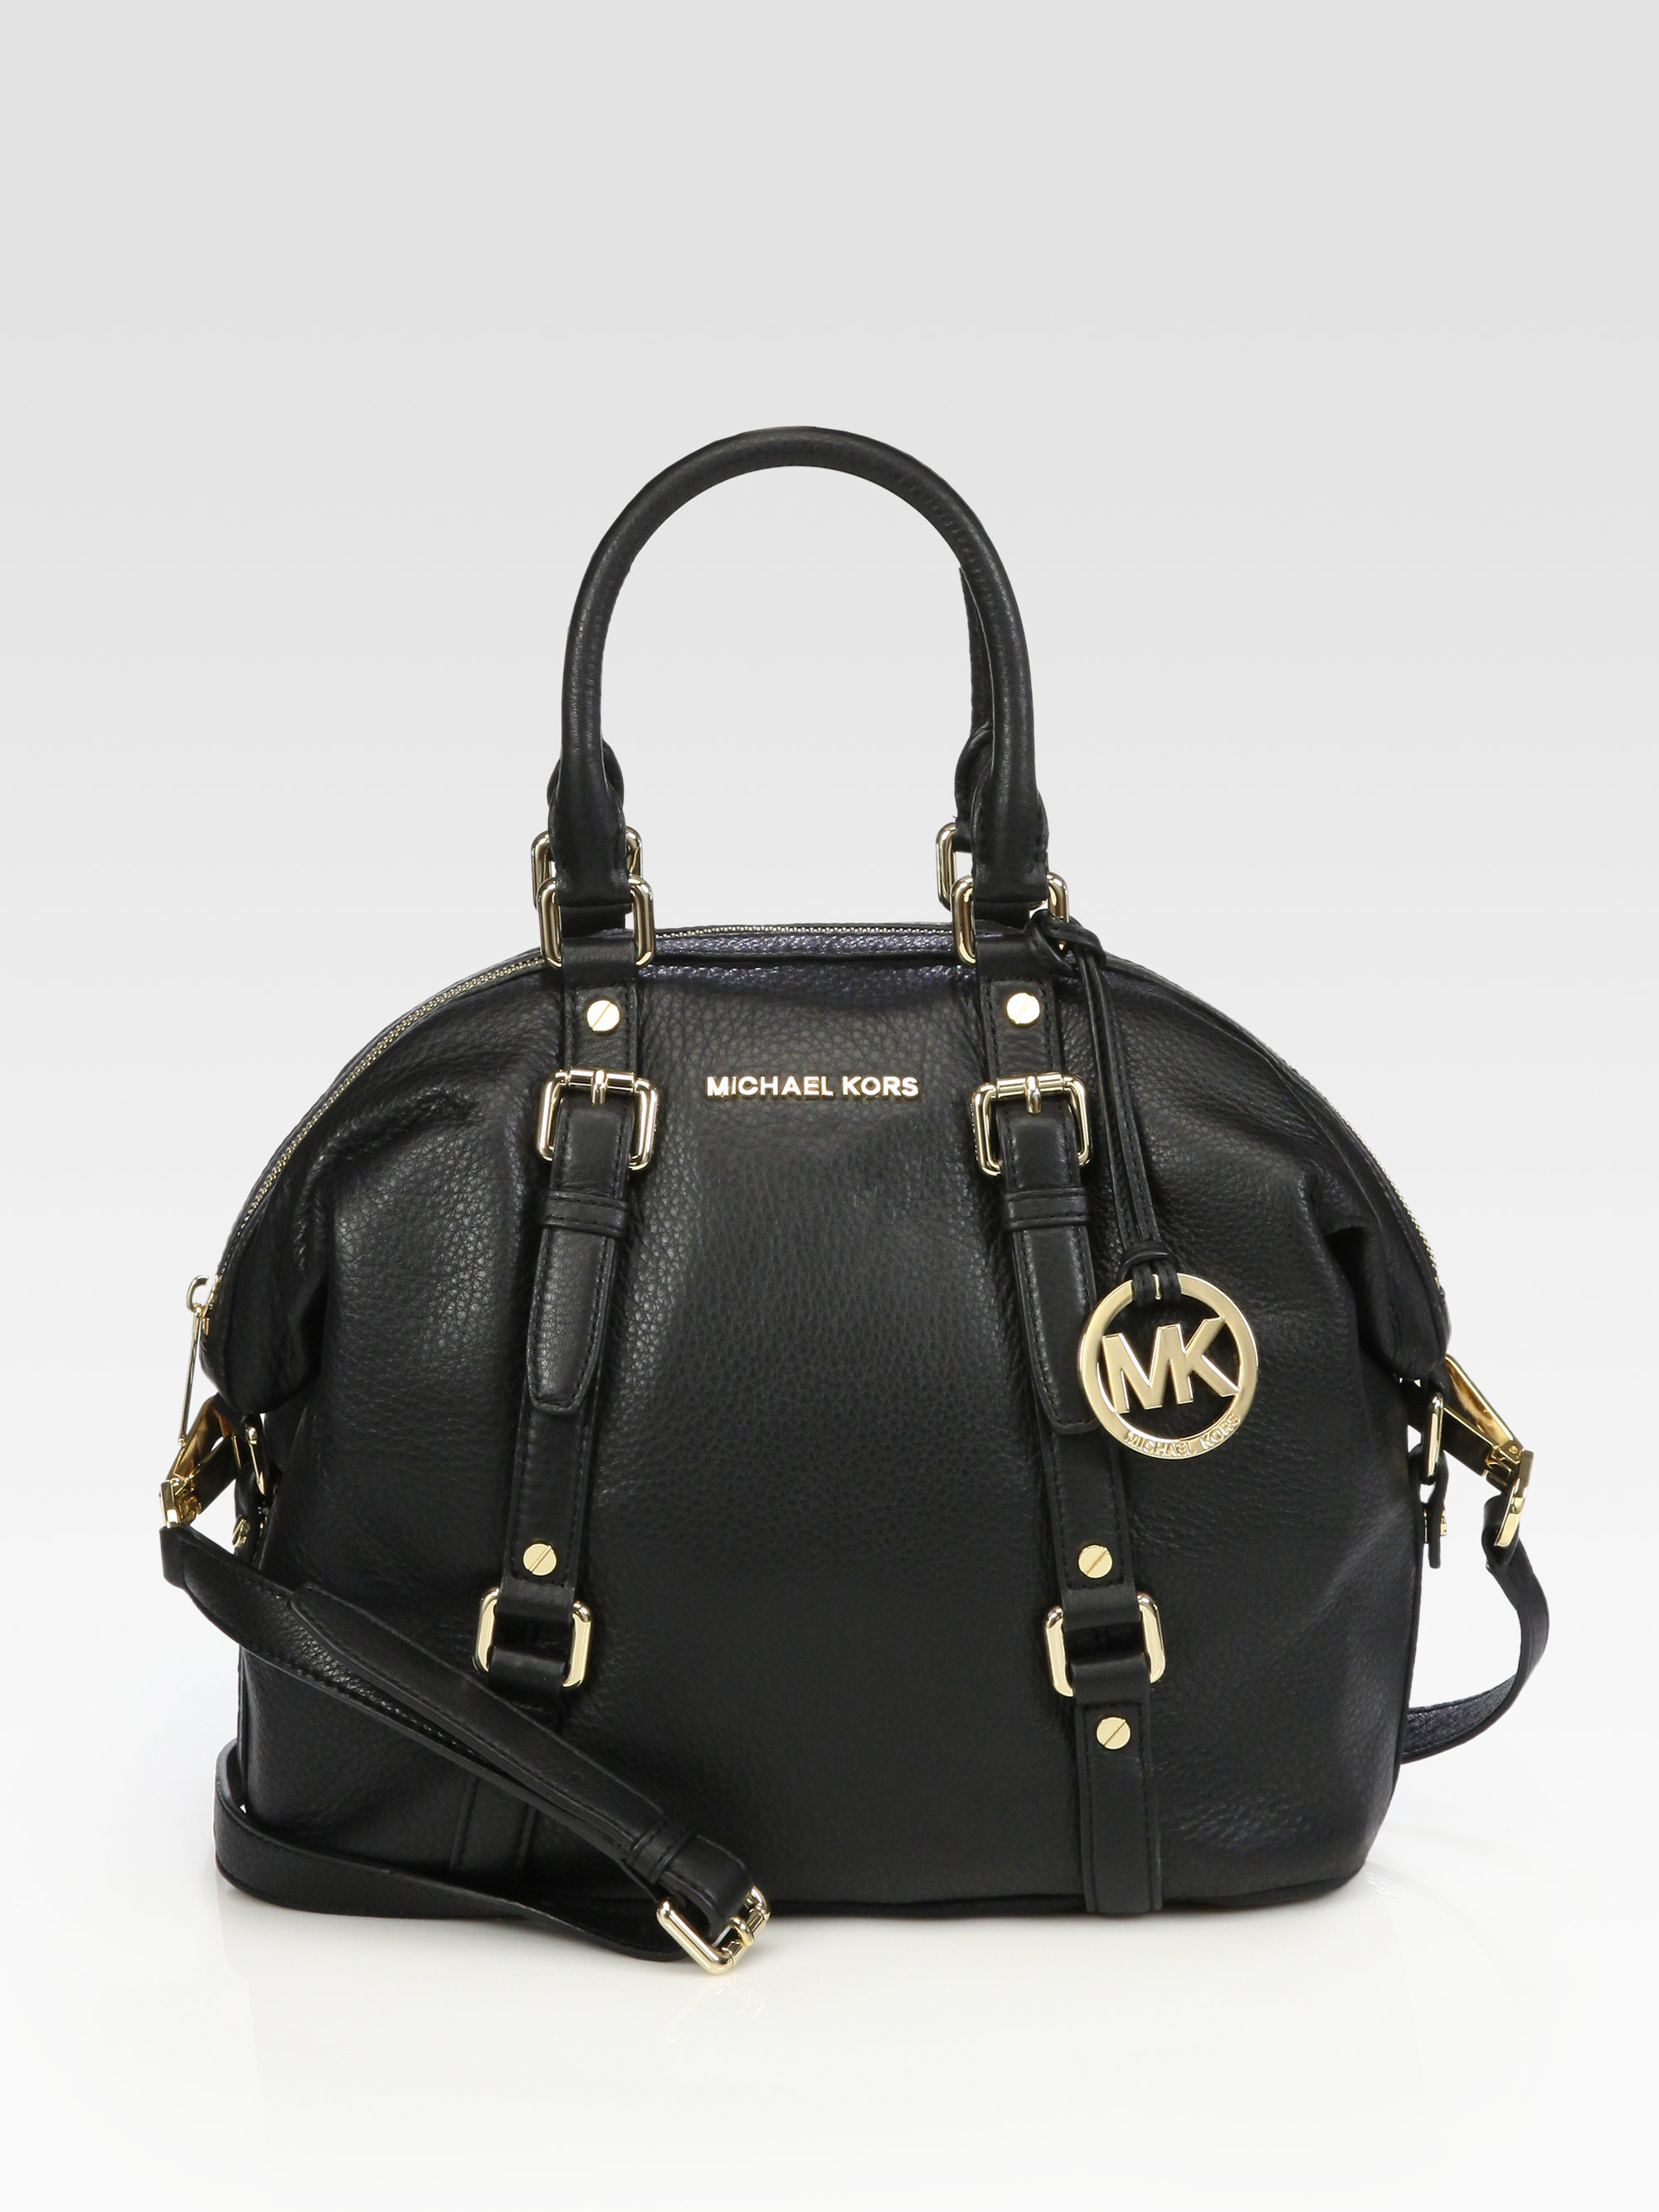 michael michael kors bedford medium satchel in black lyst. Black Bedroom Furniture Sets. Home Design Ideas